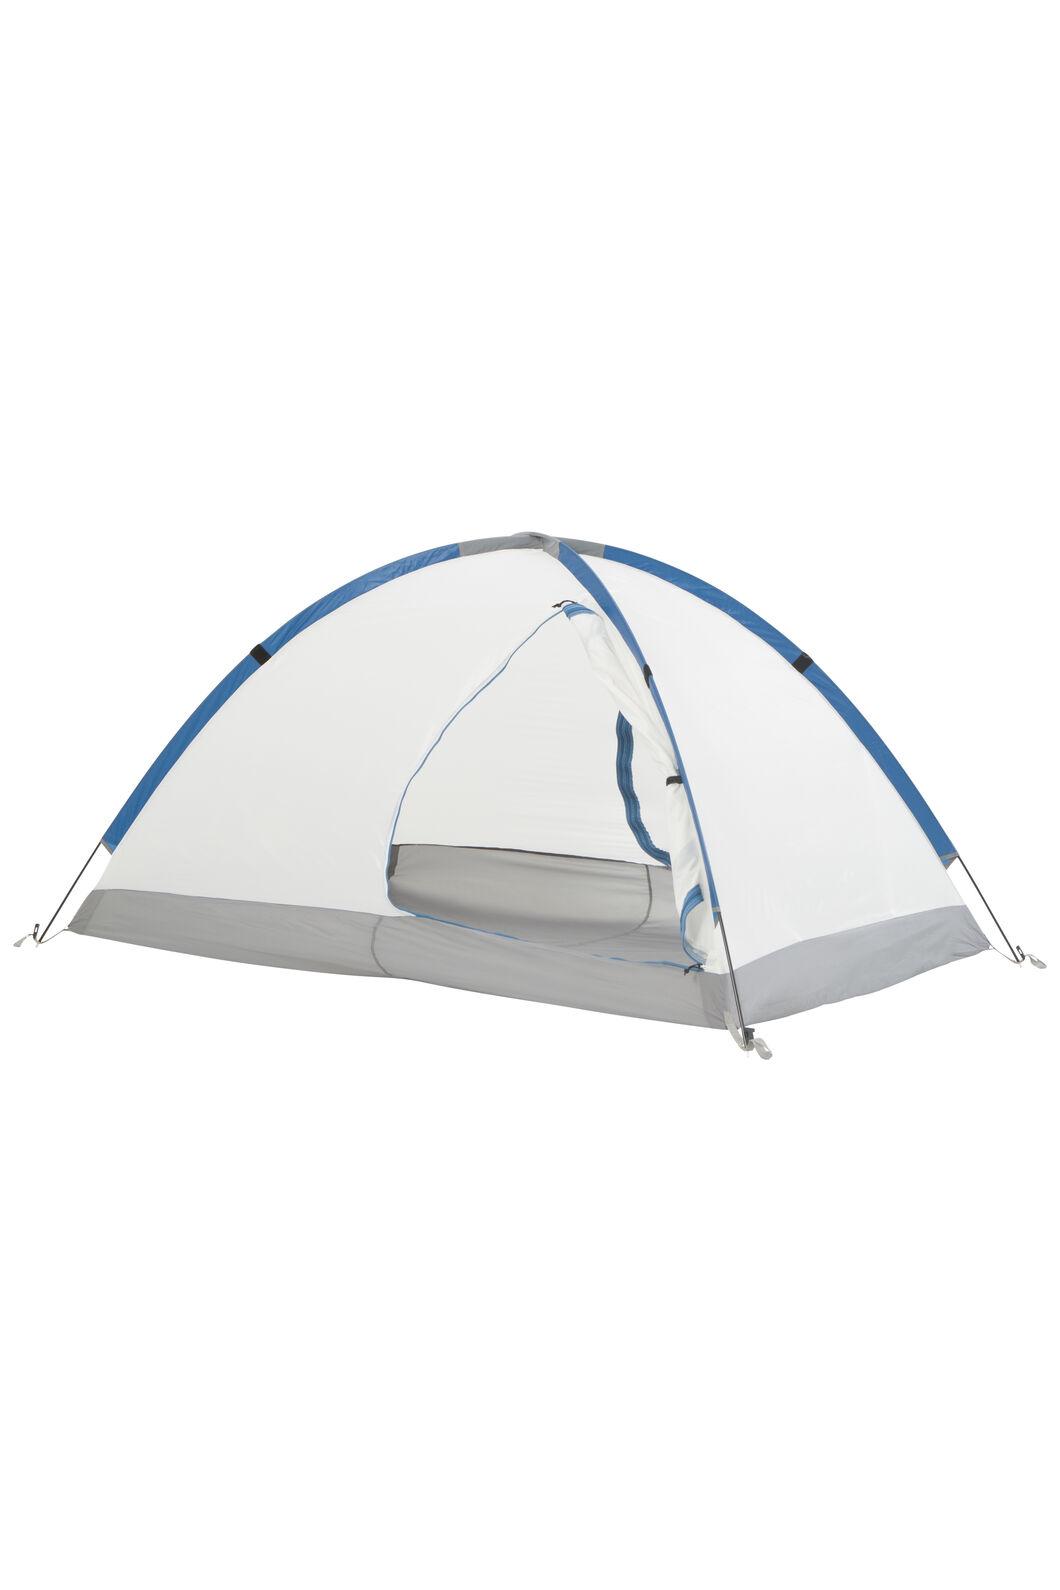 Macpac Apollo Camping Tent | Macpac